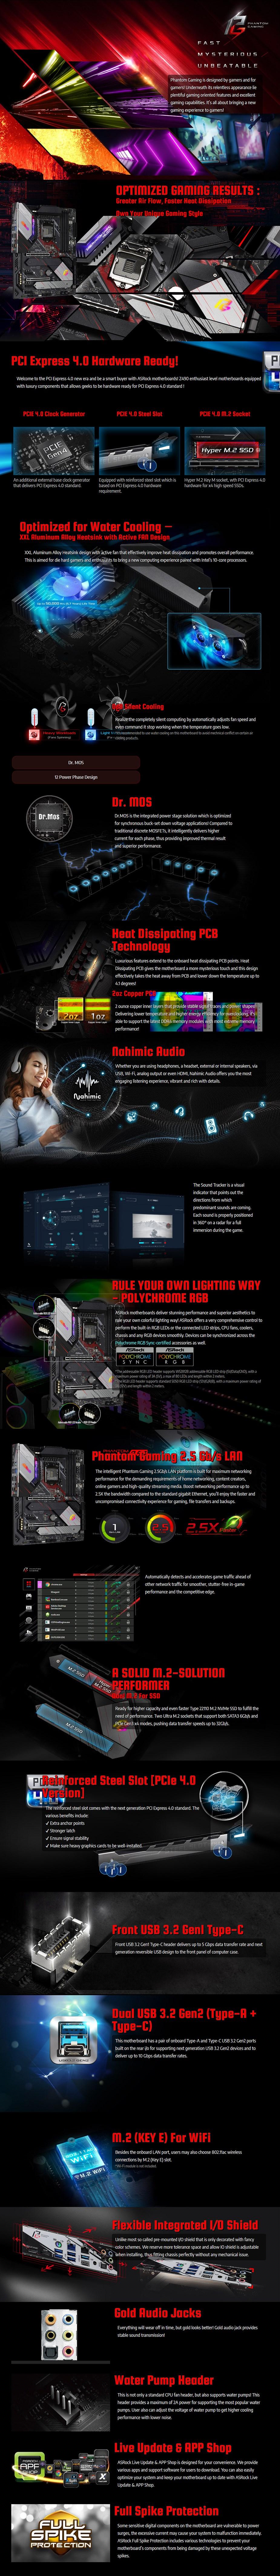 ASRock Z490 PG Velocita LGA 1200 ATX Motherboard - Overview 1